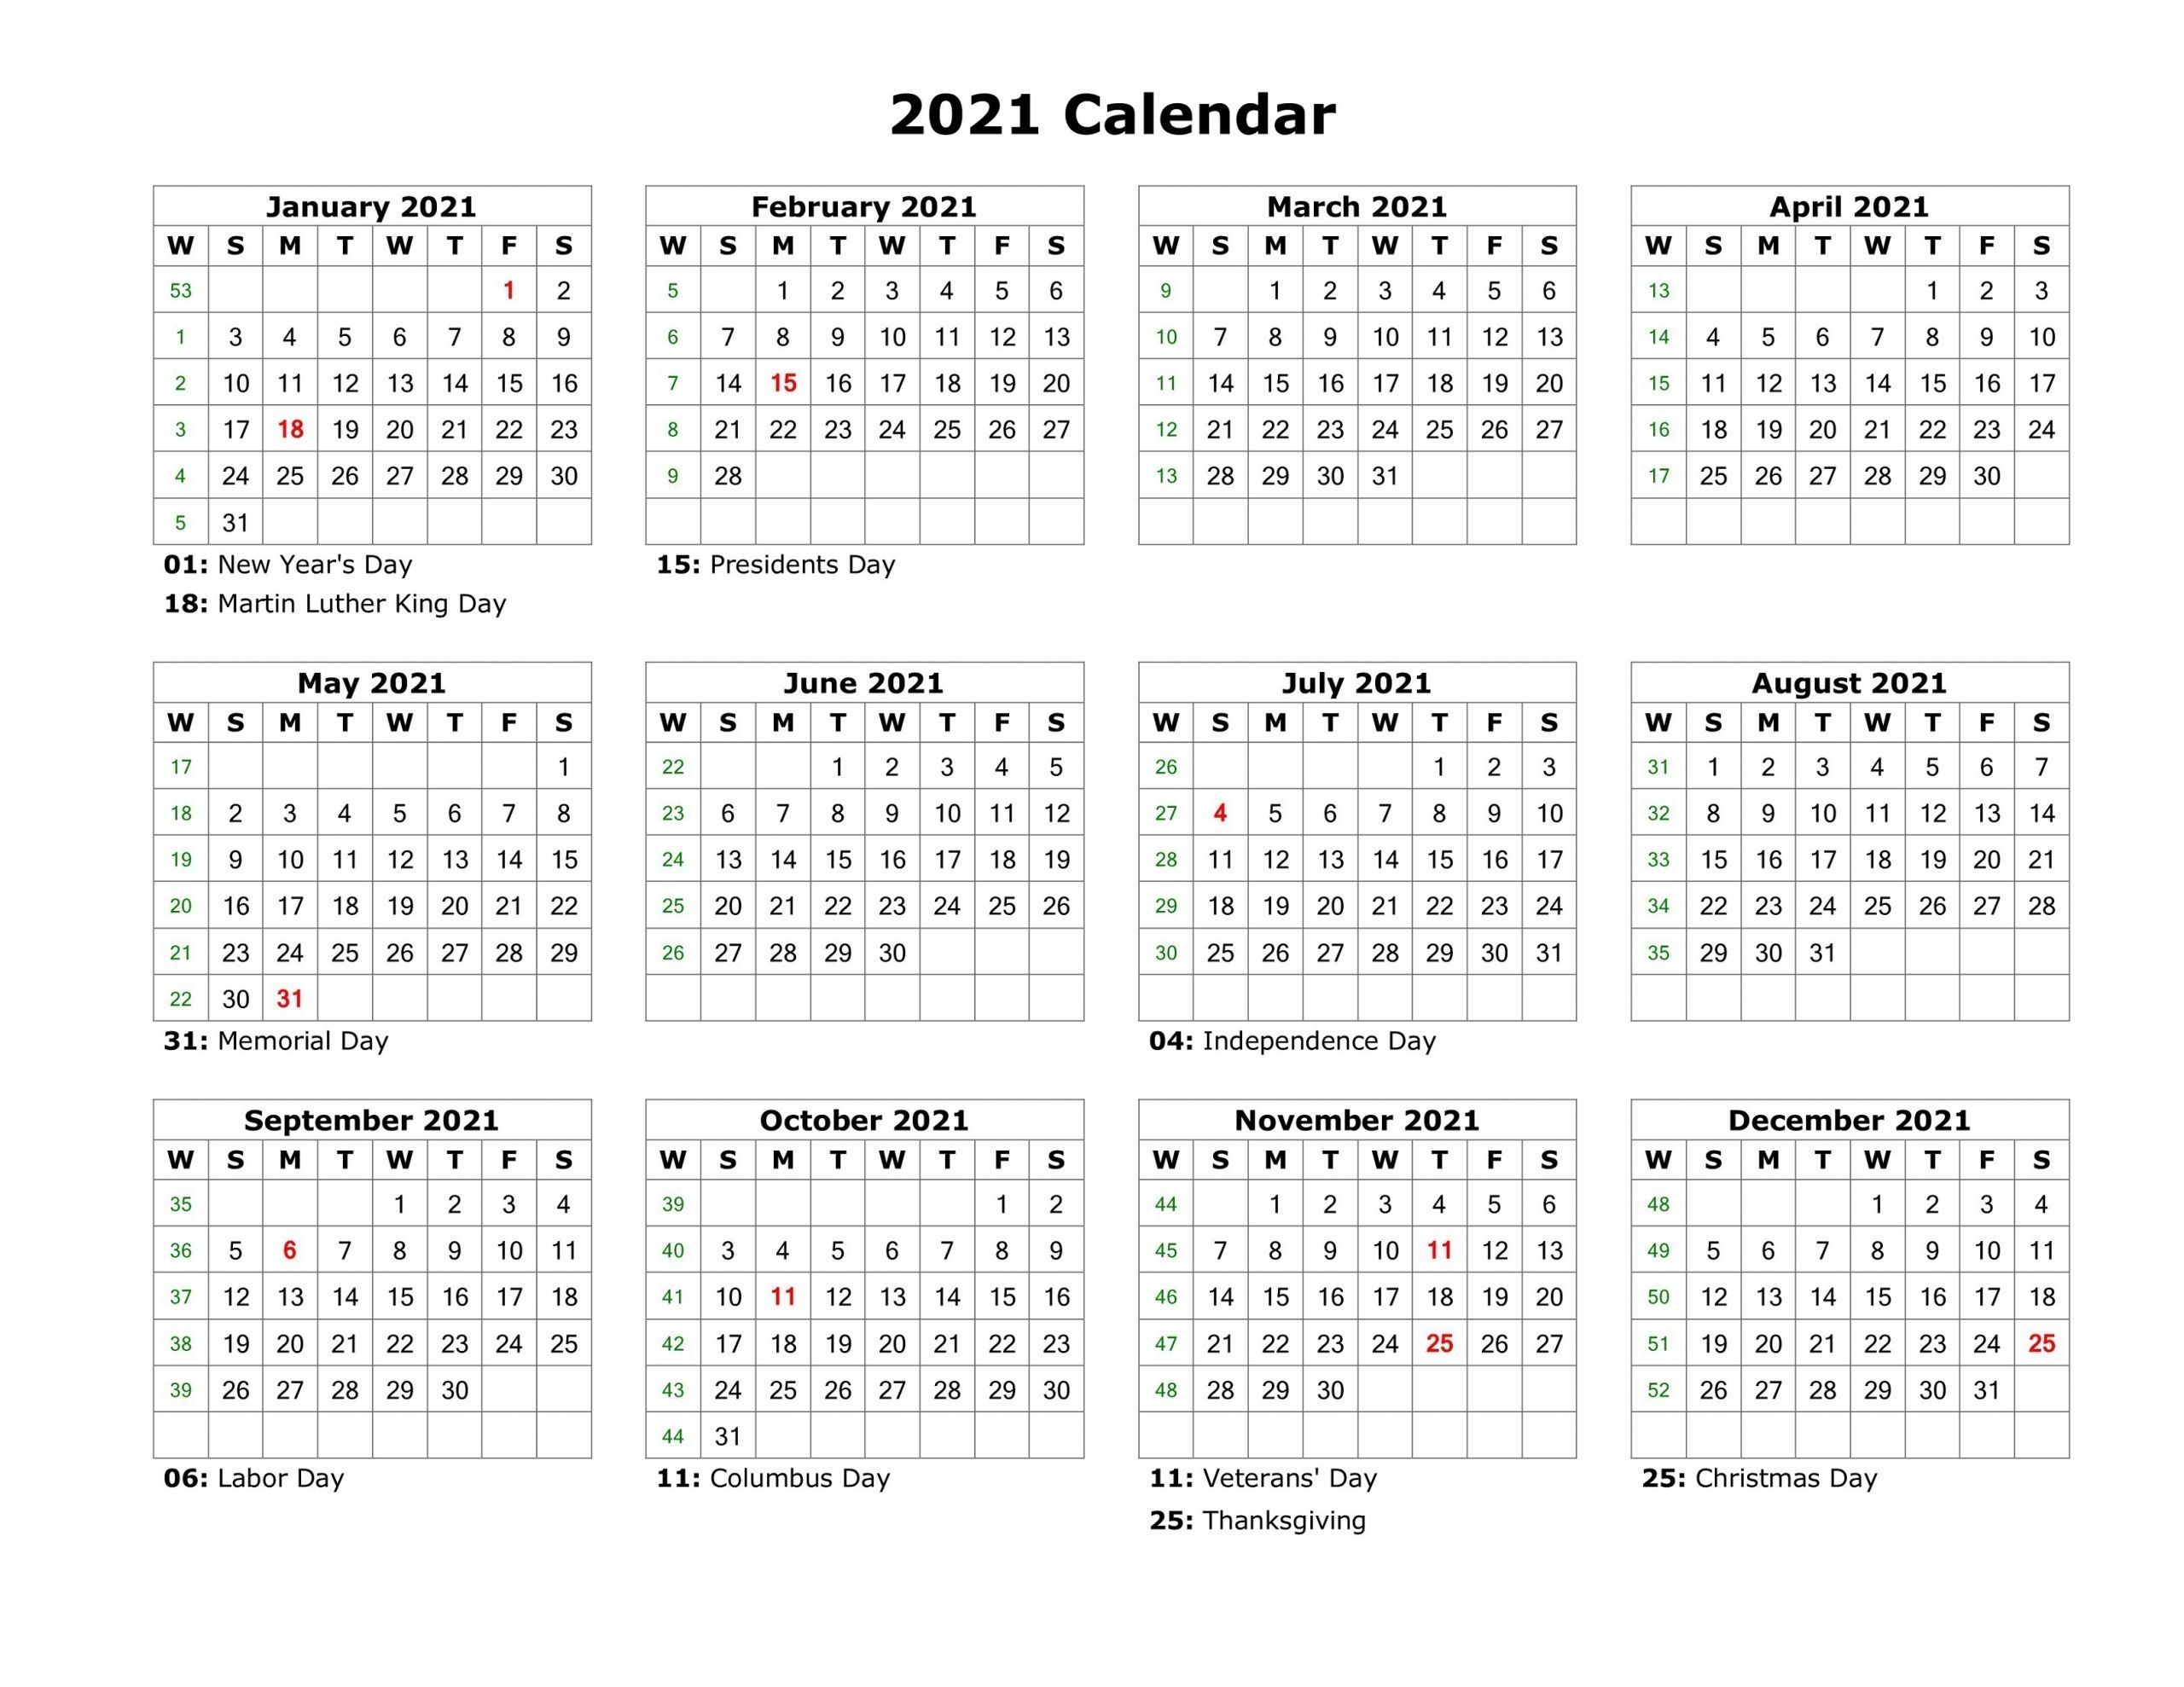 Catch Free Month At A Glance 2021 Calendar